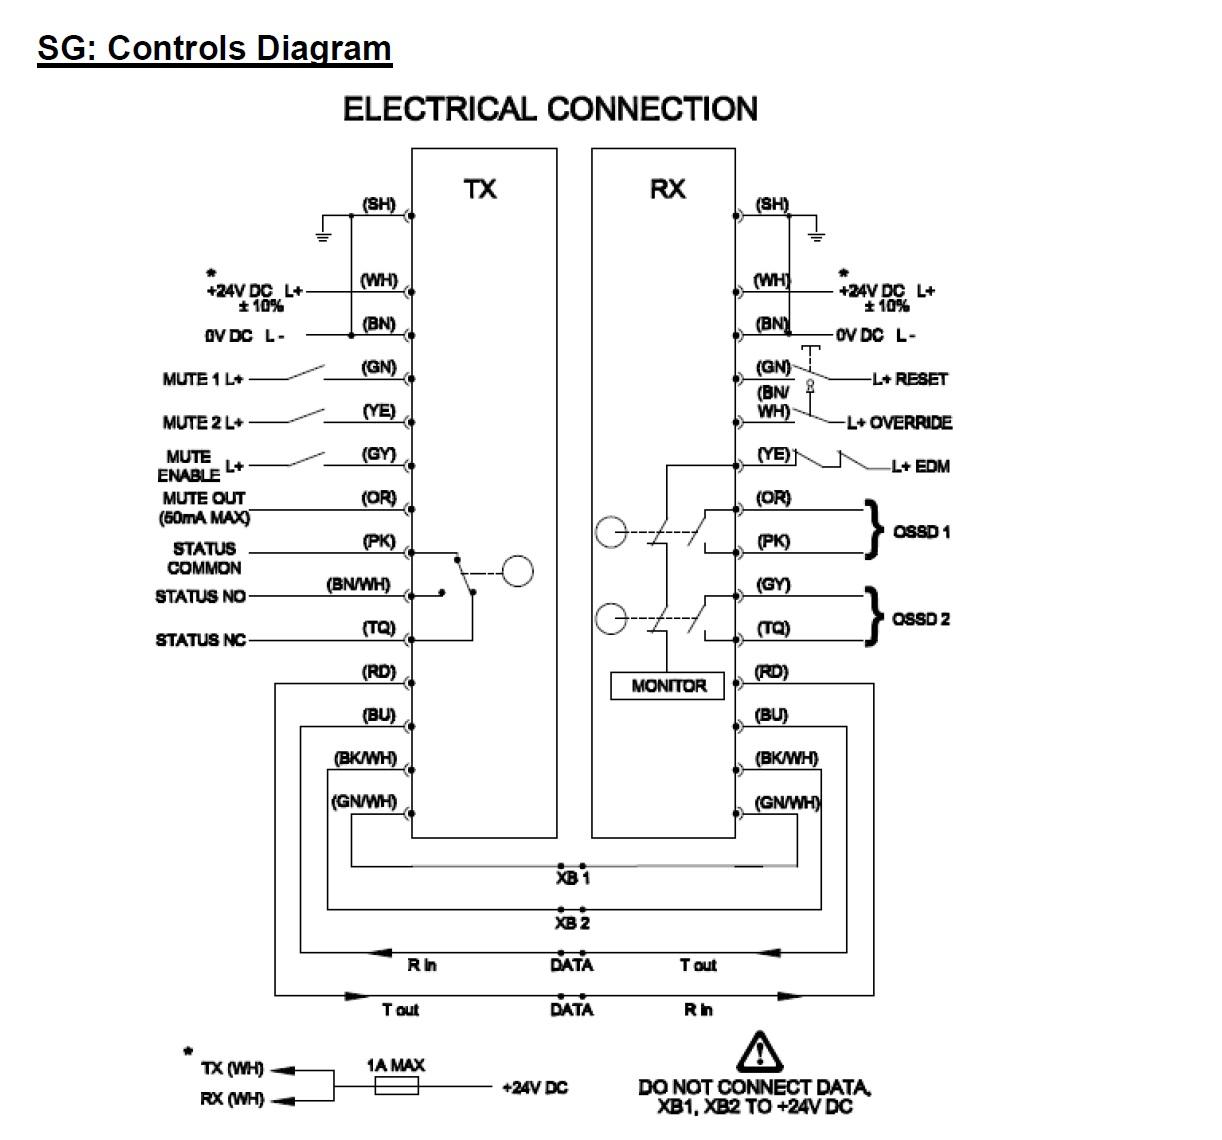 sg_controls?resize=800%2C746 light curtain wiring diagram starter wiring diagram, relay wiring safety mat wiring diagram at eliteediting.co